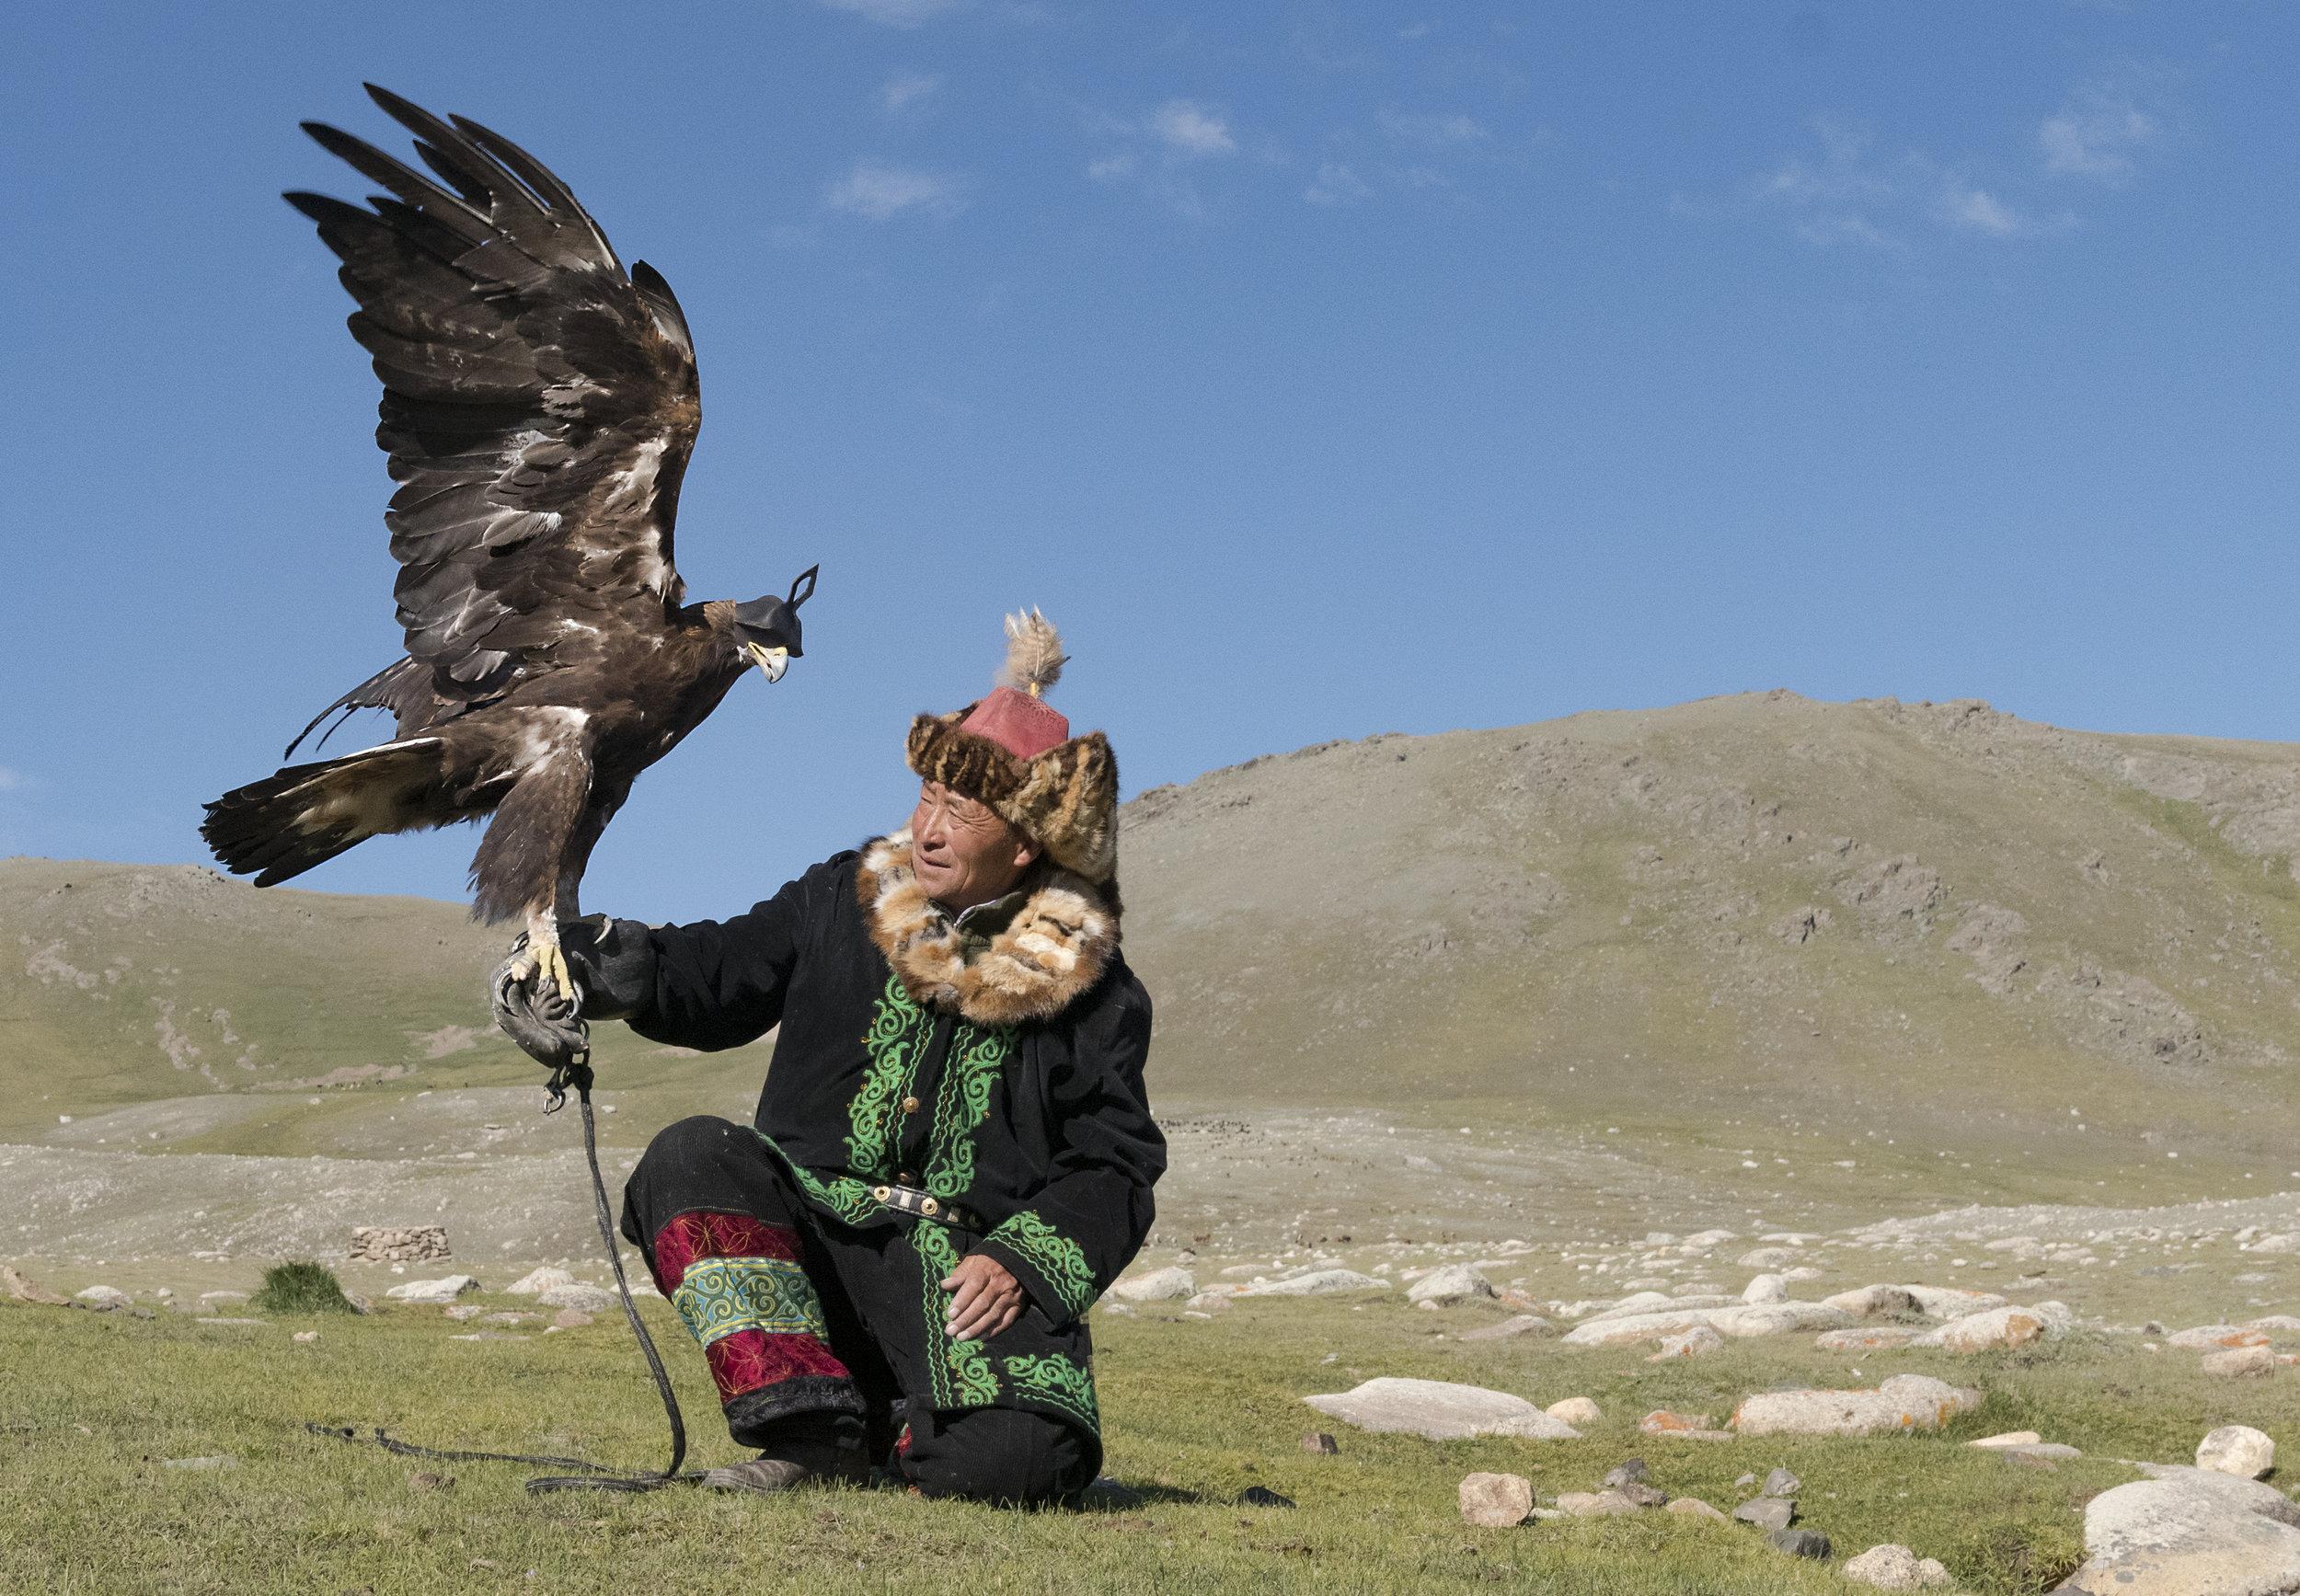 eagle hunter admires his eagle.jpg